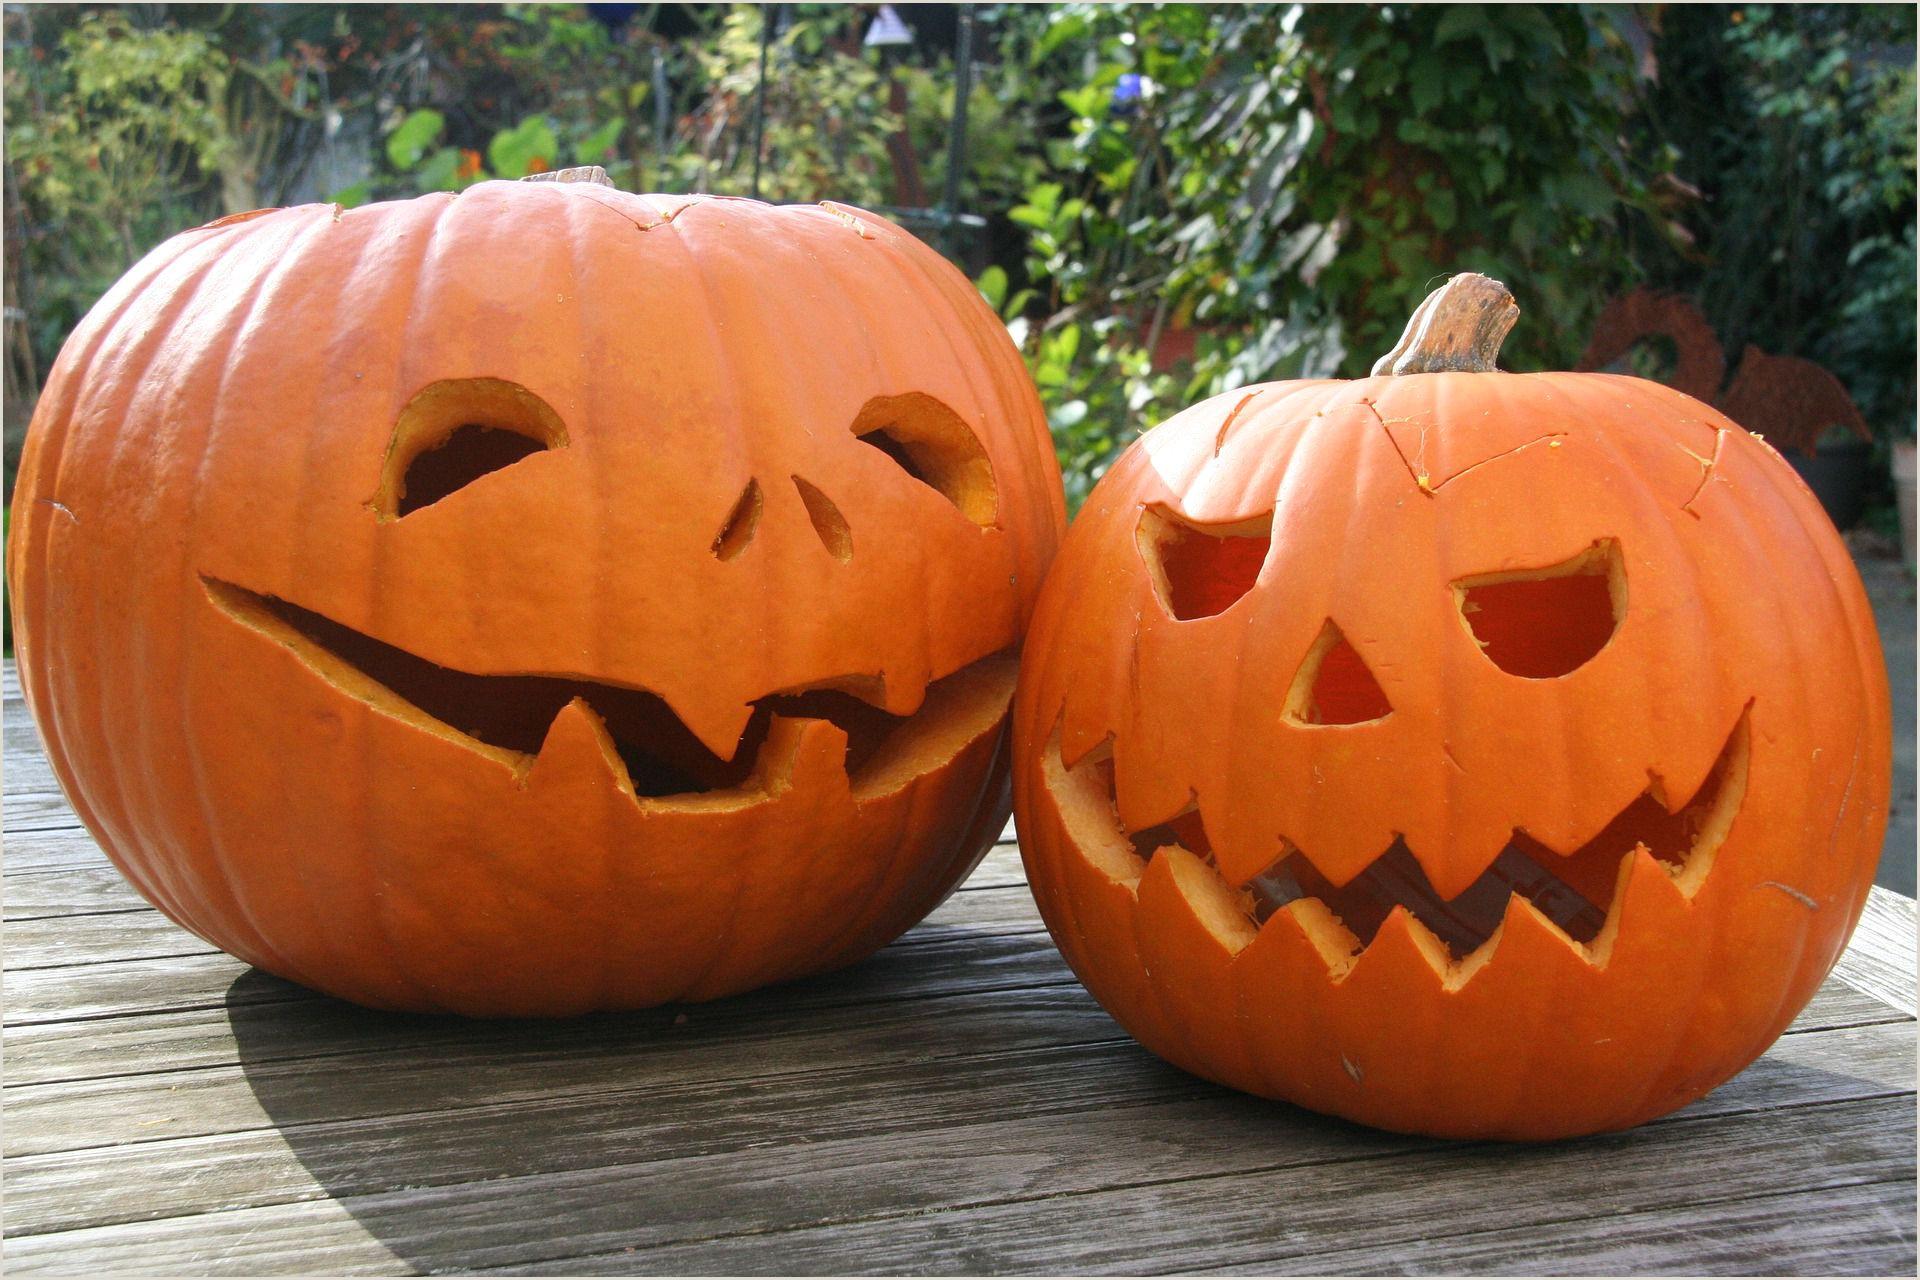 Scar Pumpkin Carving Patterns Free Pumpkin Carving Patterns